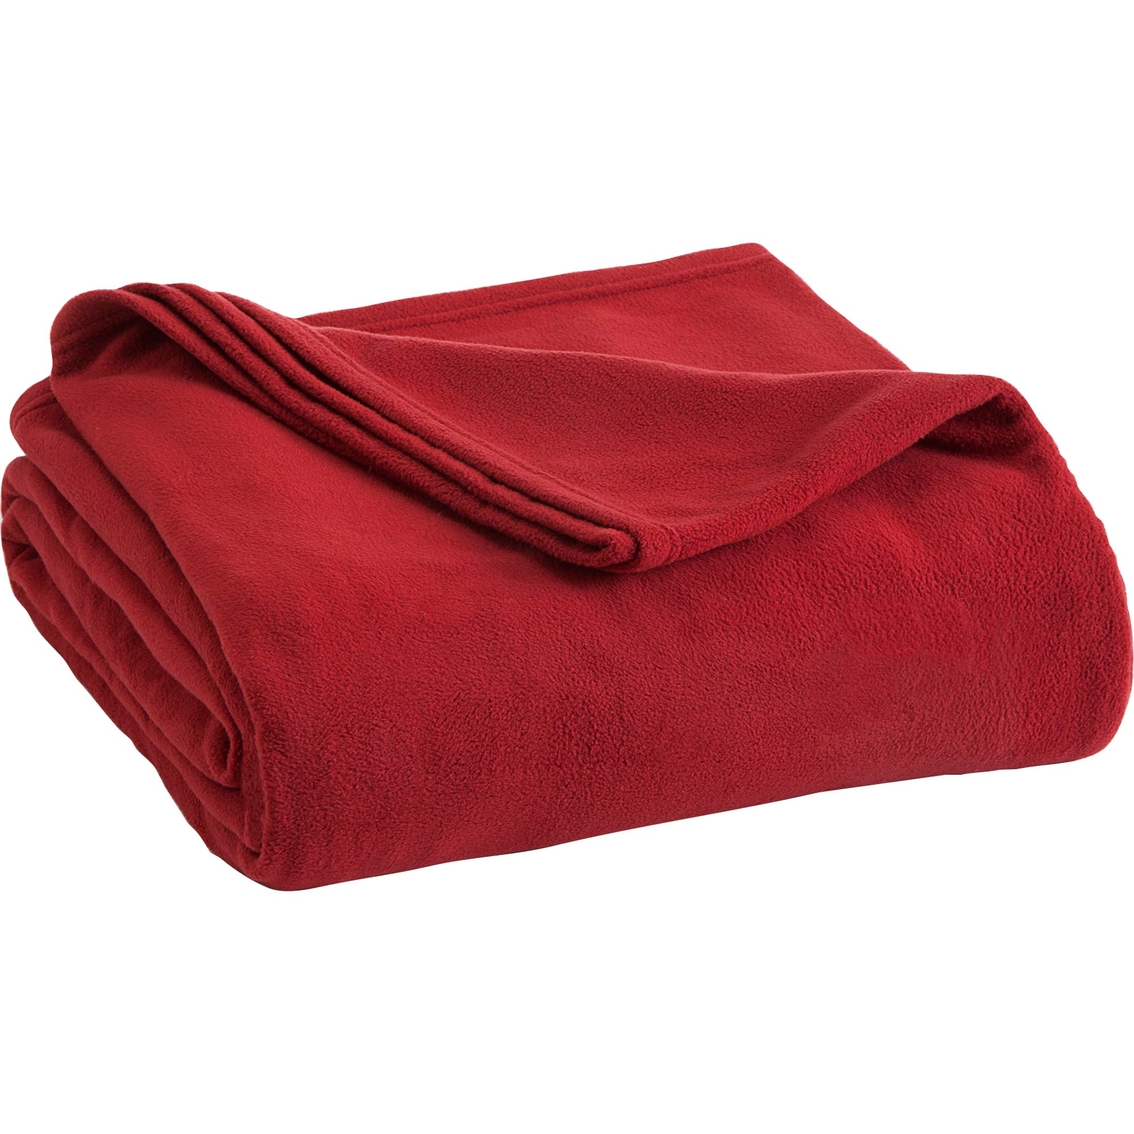 Vellux fleece blanket blankets throws home for Vellux blanket